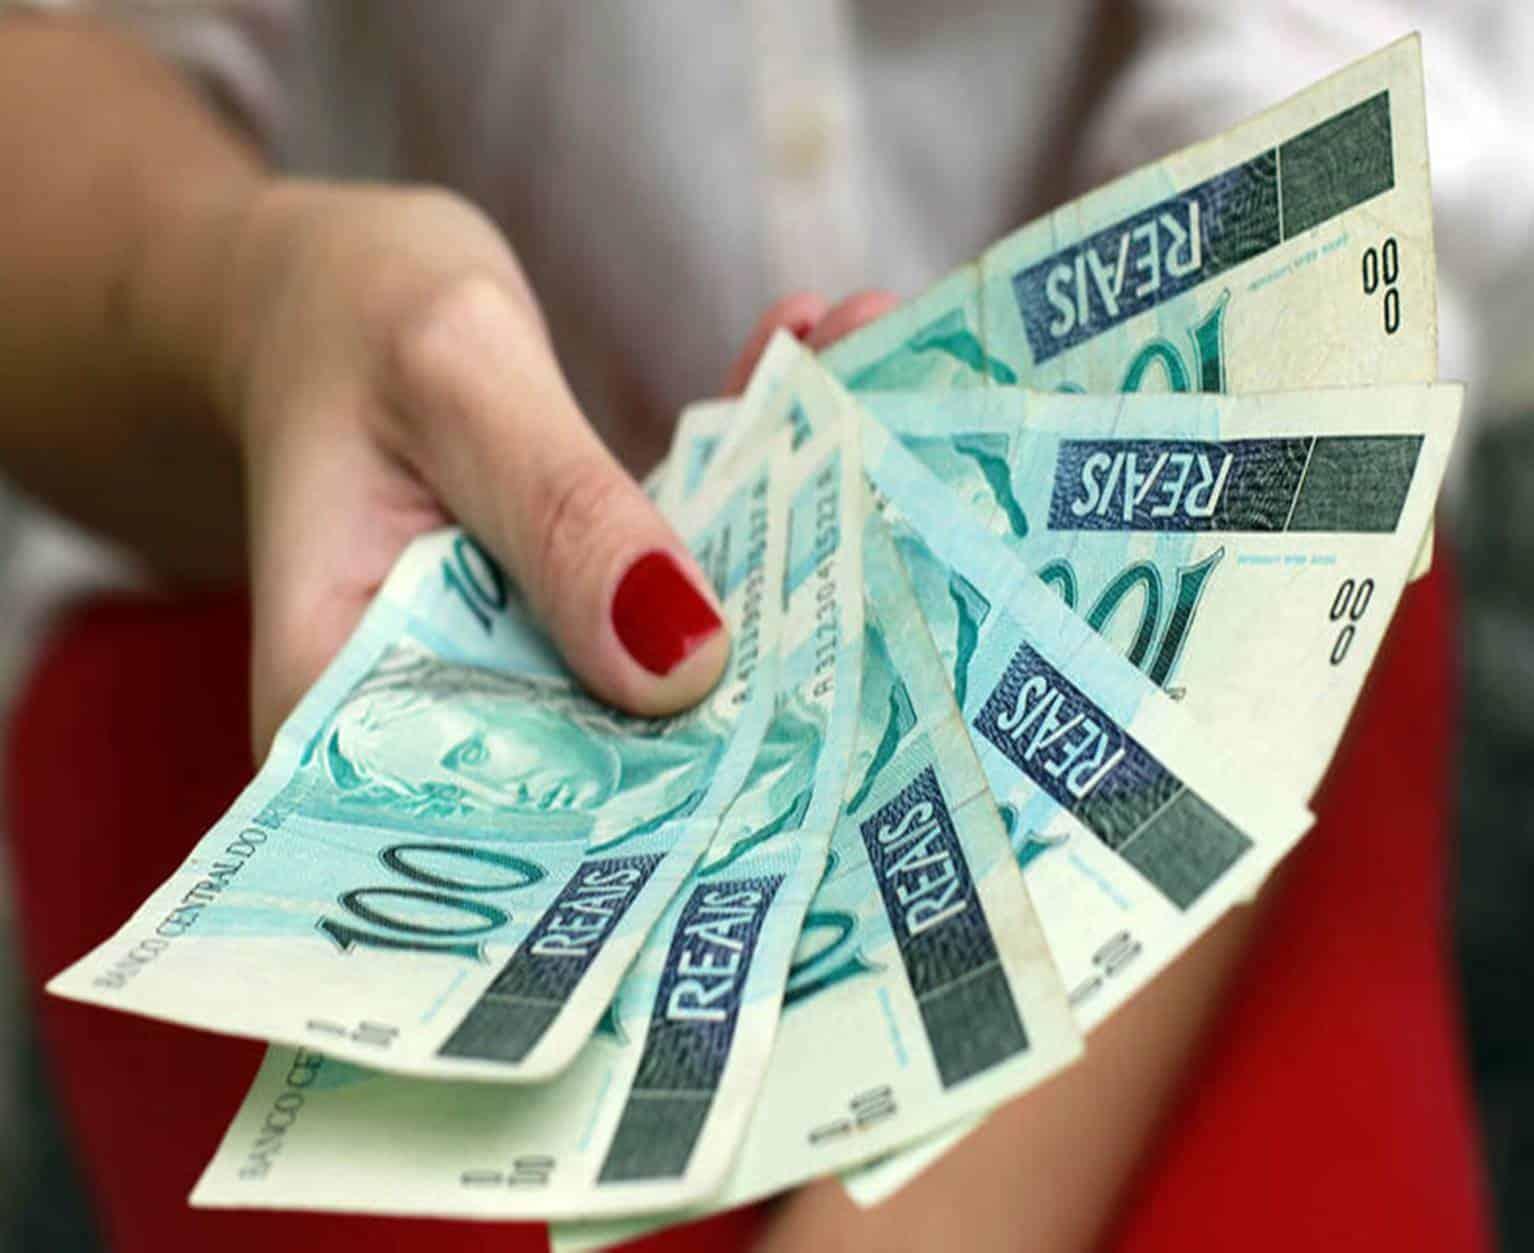 Presidente sanciona lei que aumenta salário mínimo de 2020